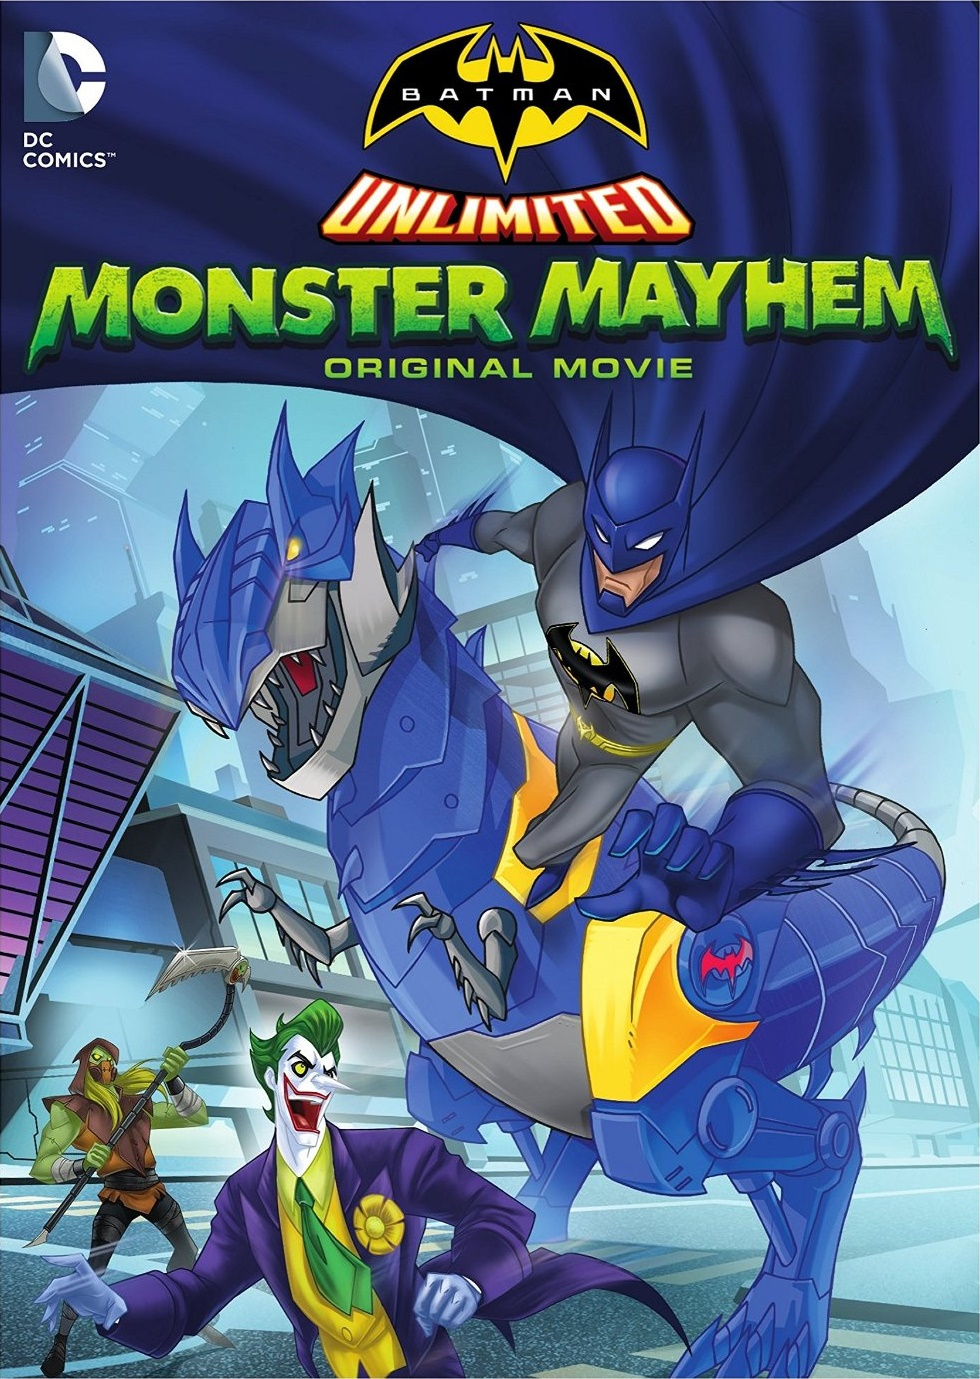 Batman ilimitado: Caos de monstruos